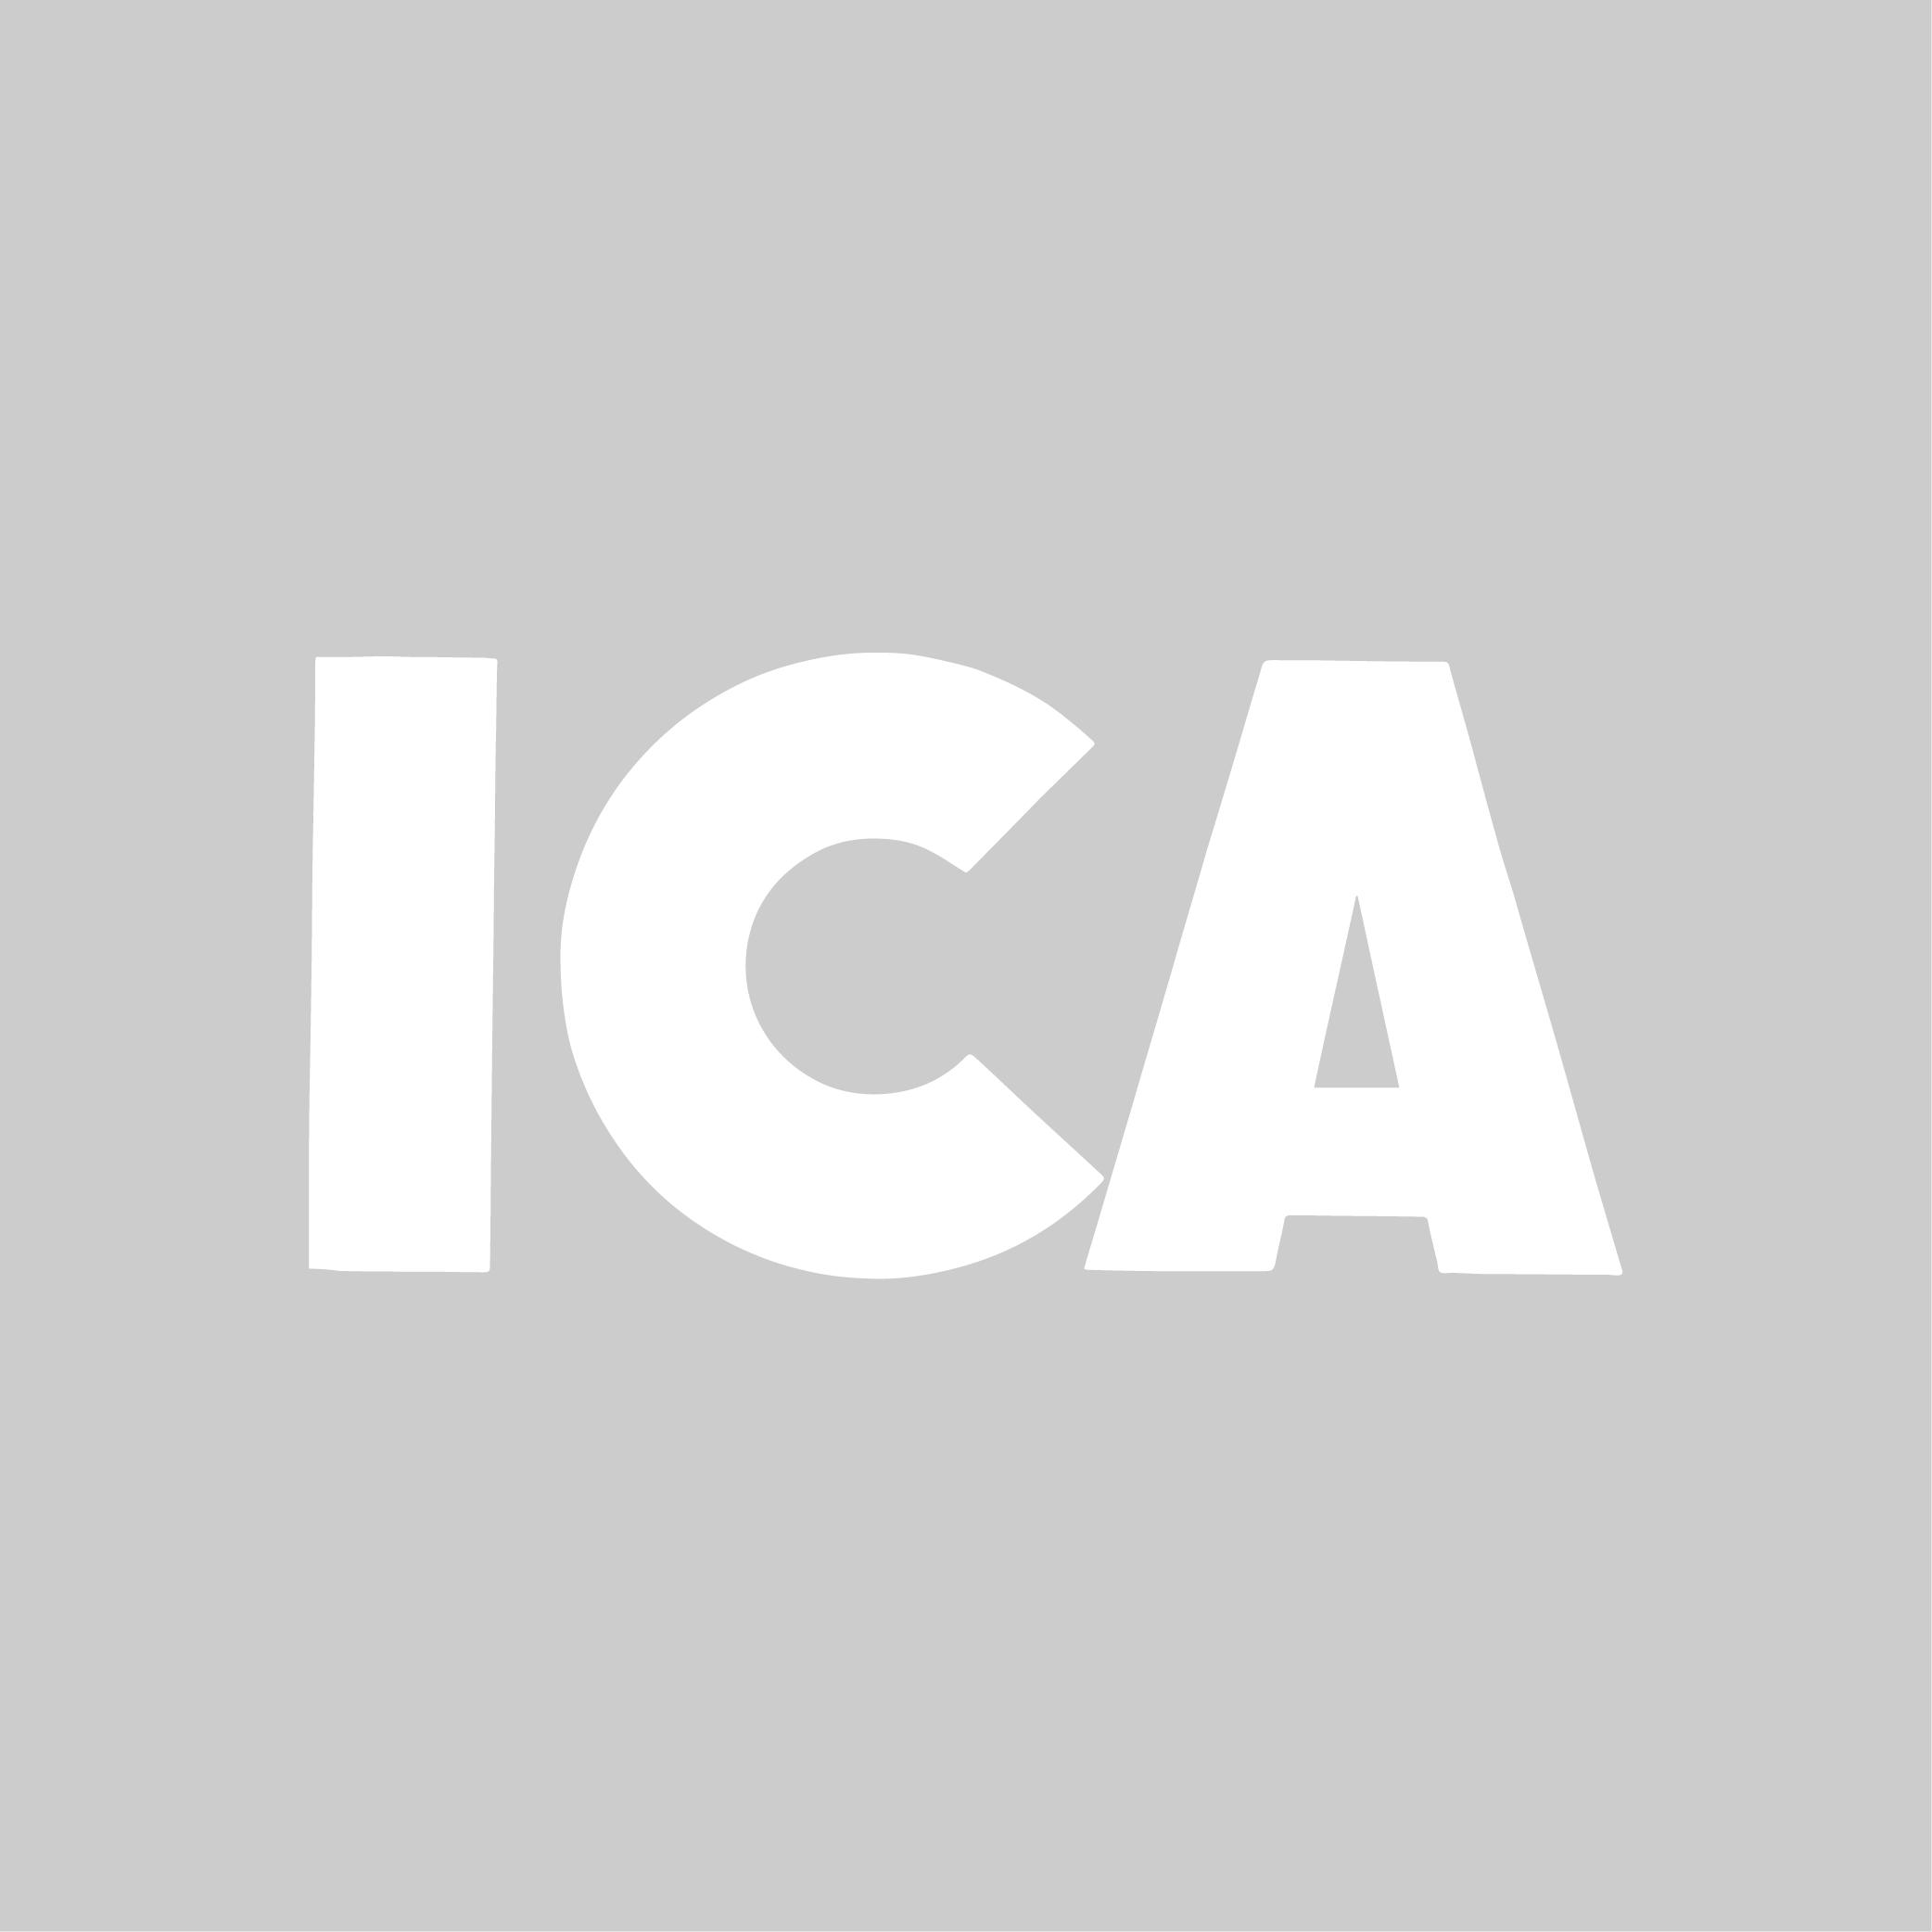 ICA | Films